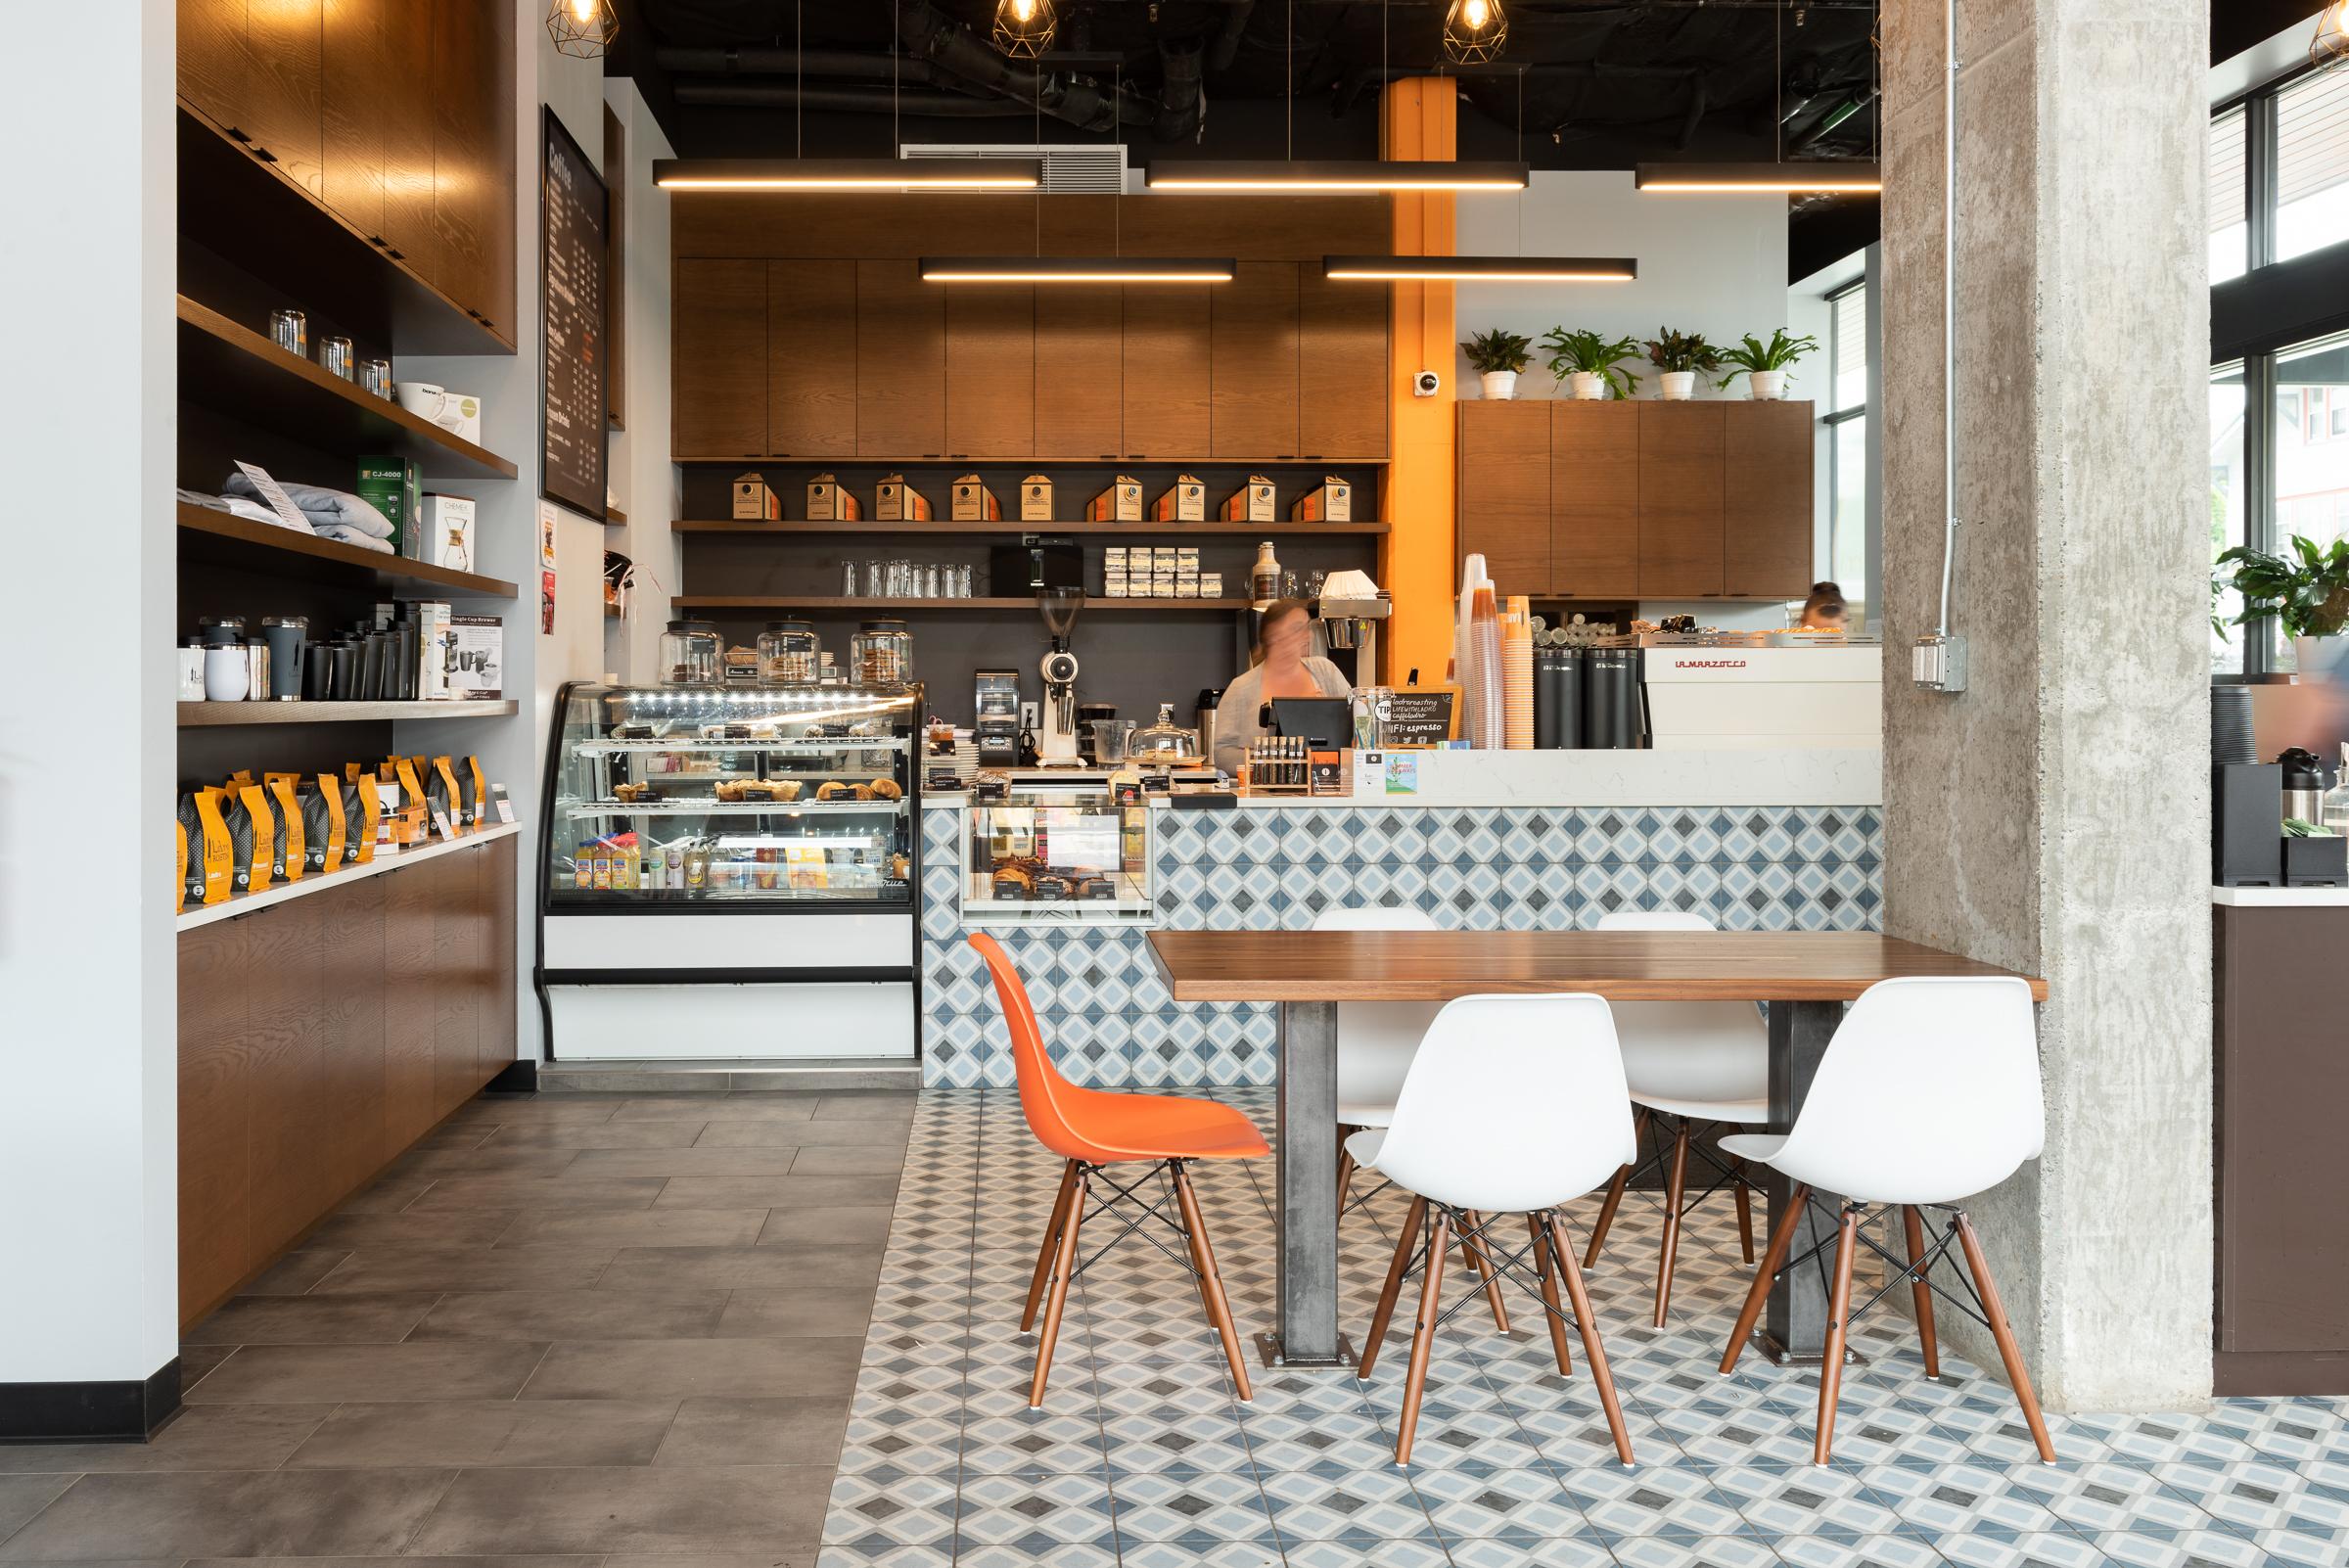 Caffe Ladro, Ravenna